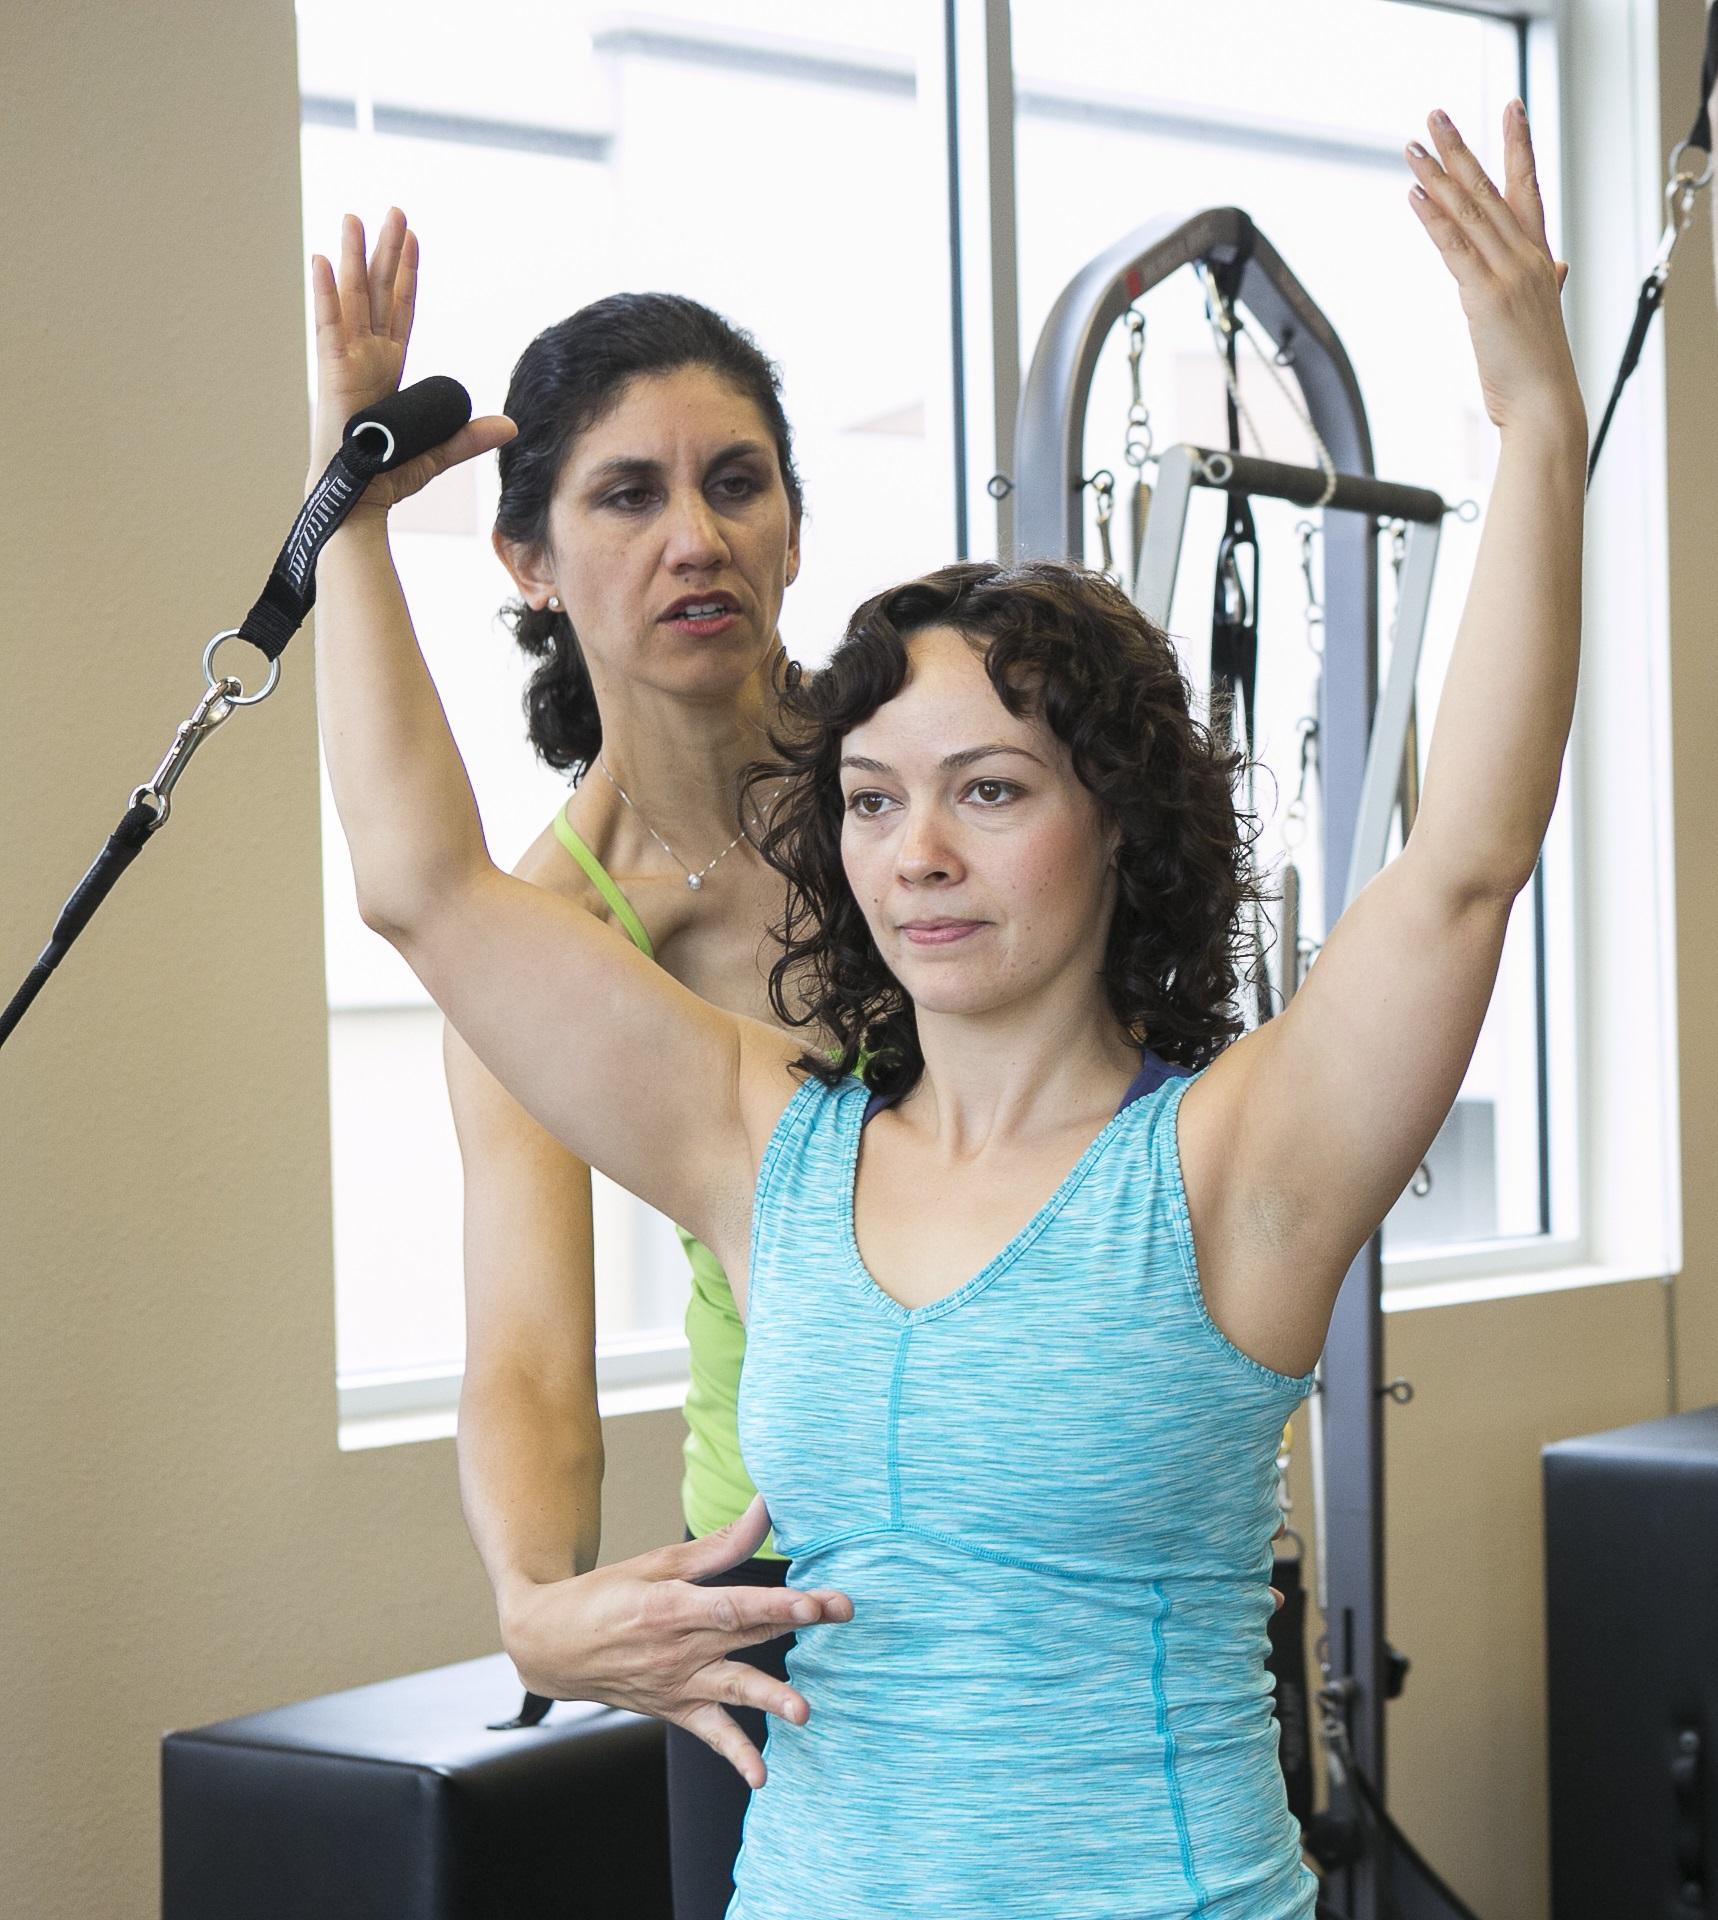 Pilates, Centering the Body